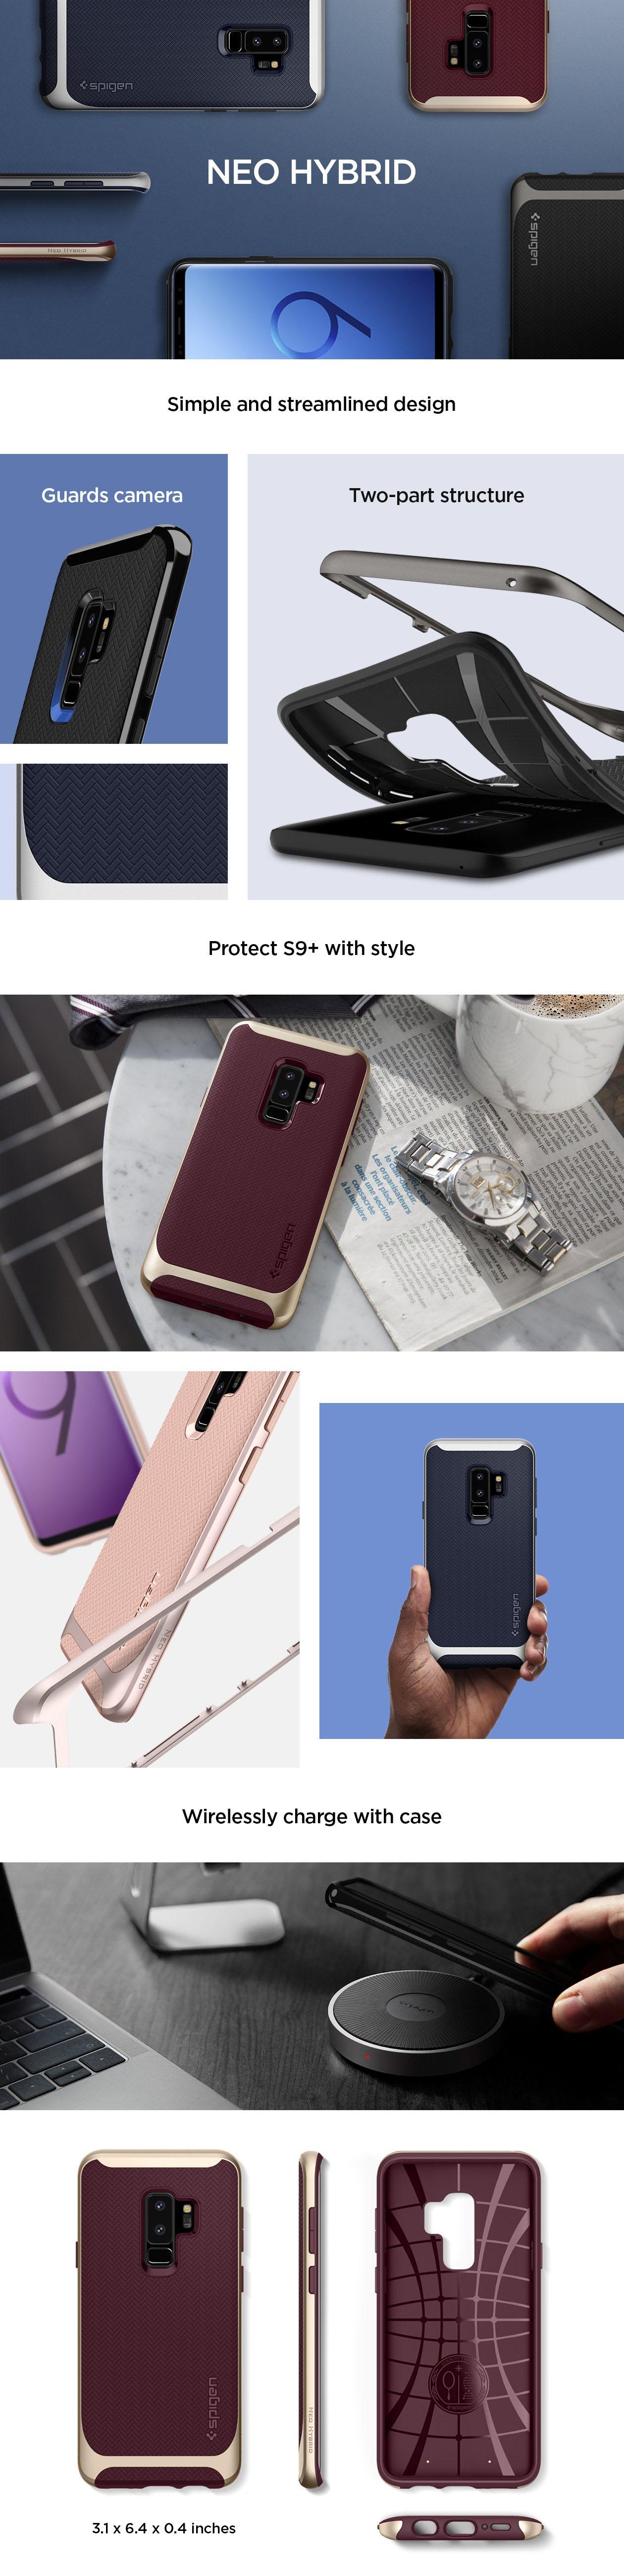 Buy Spigen Samsung S9 Case Galaxy Casing Screen Protector 100 Note 9 Modern Slim Design Neo Hybrid Midnight Black Series Color Gunmetal Burgundy Lilac Purple Shiny Arctic Silver Pale Dogwood